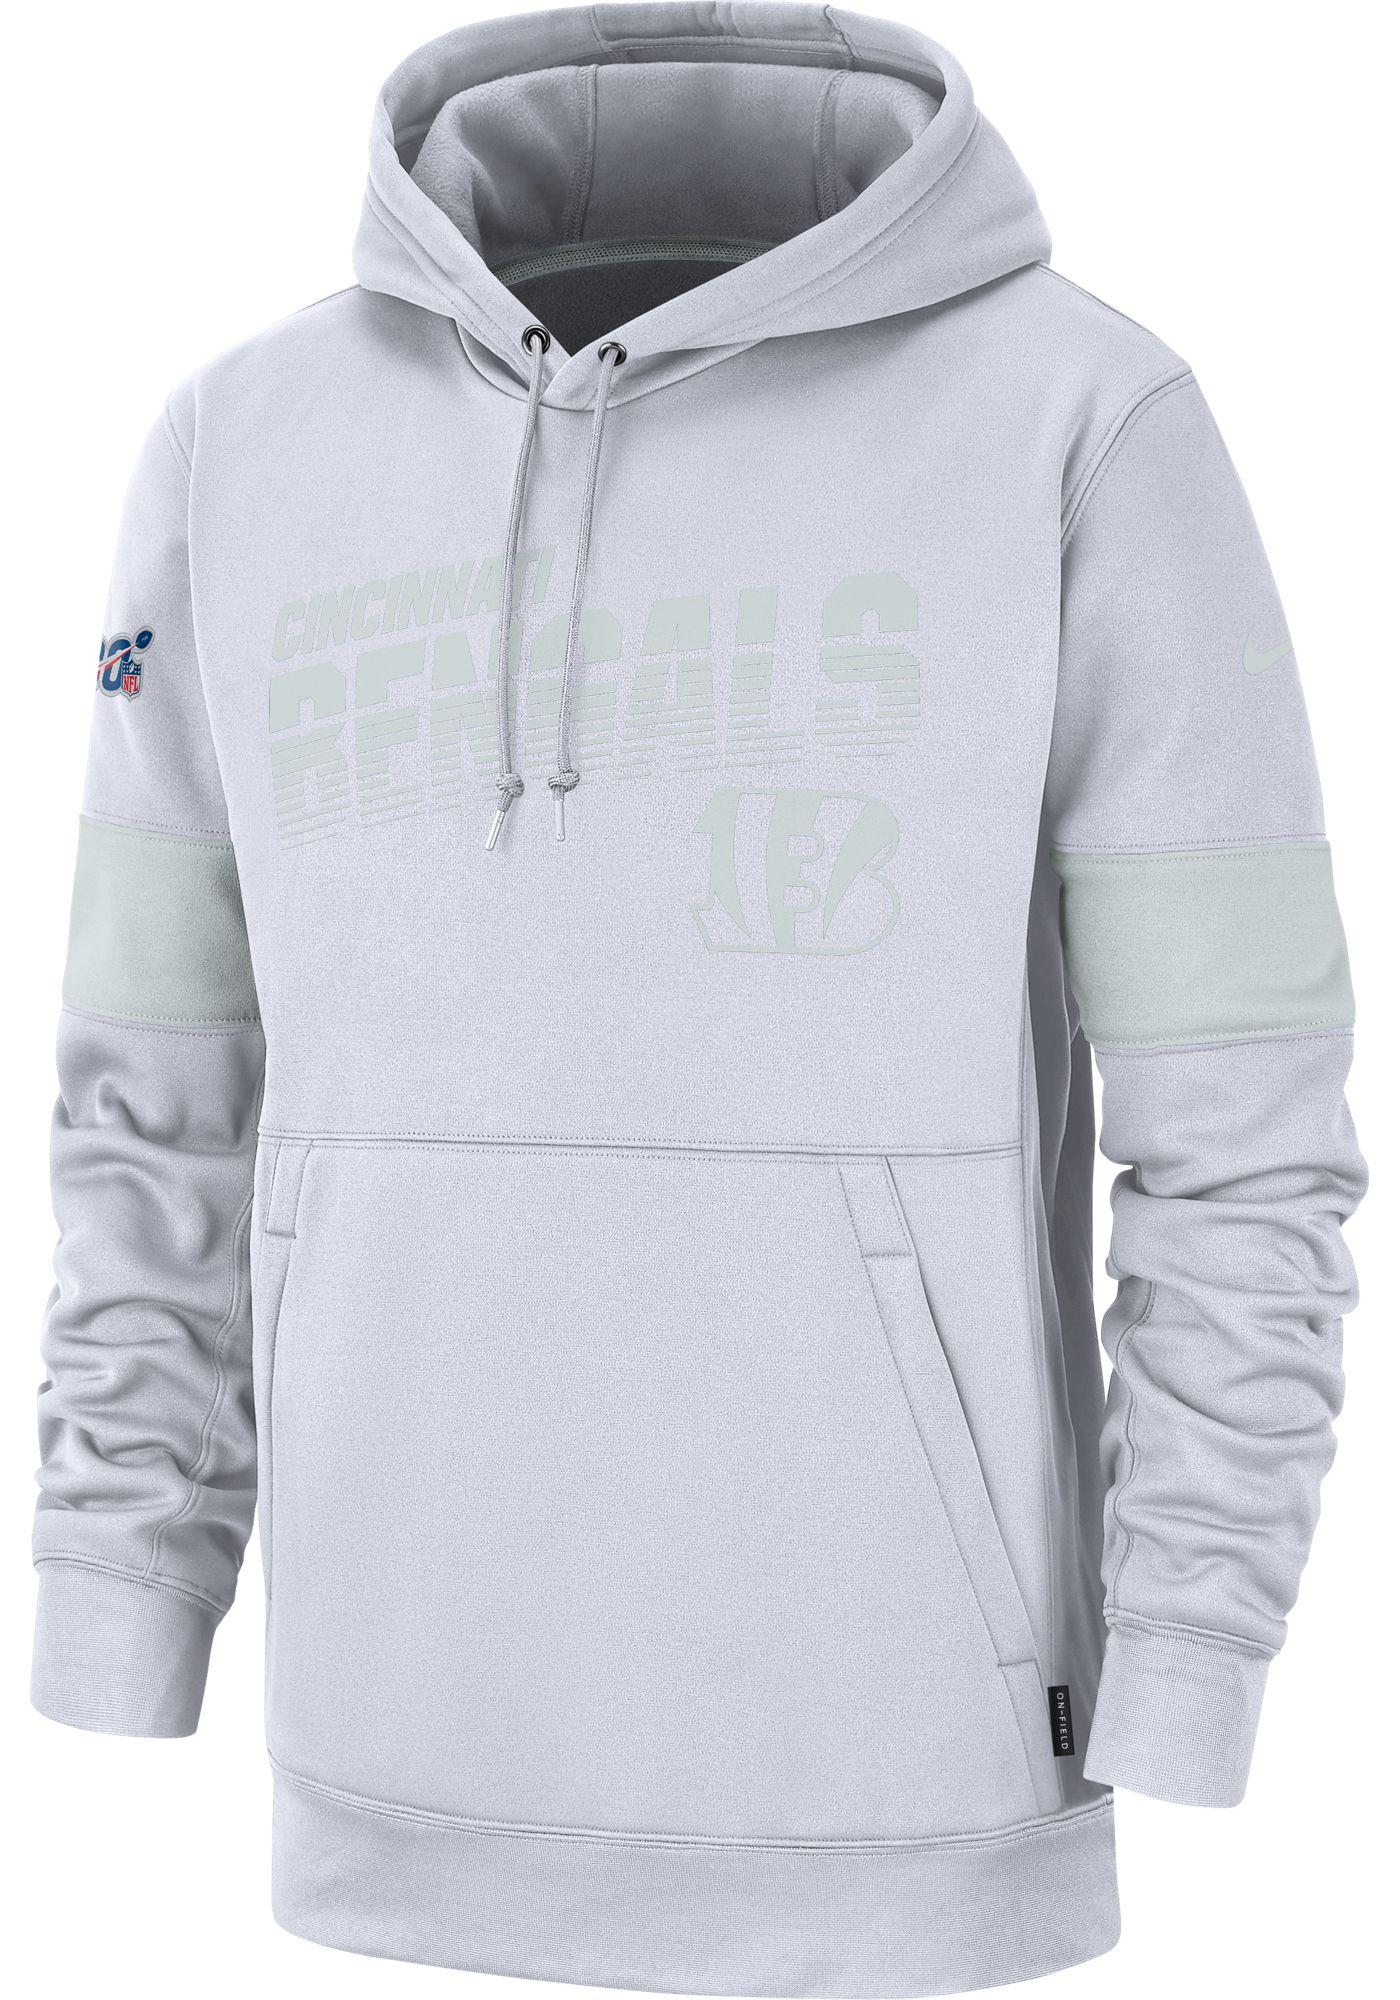 Nike Men's Cincinnati Bengals 100th Sideline Therma-FIT Pullover White Hoodie